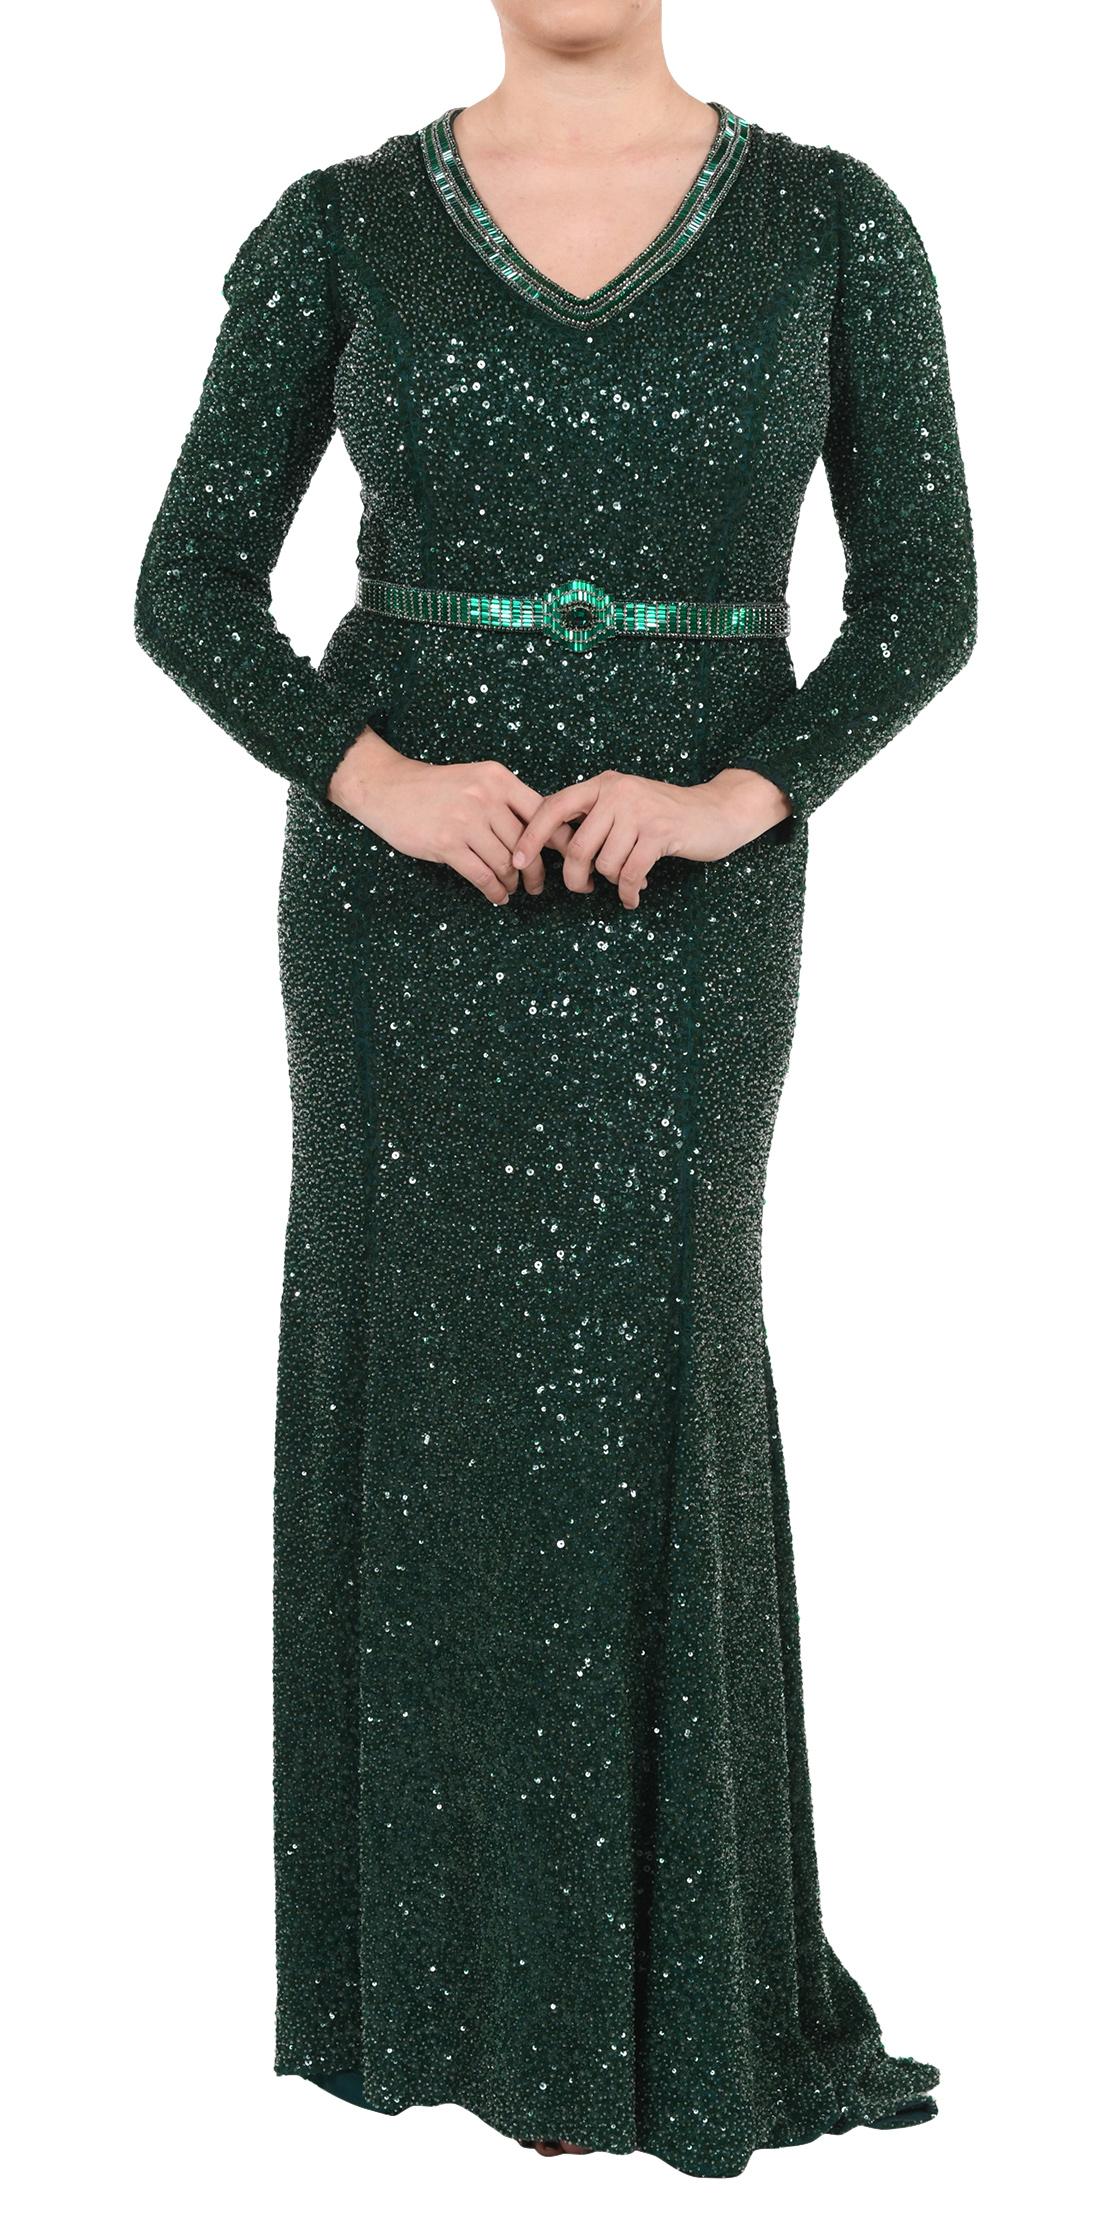 Long Lebanon In Andrew Sleeve Designer Rent Gn Sequined 24 Dress nk0wON8PX